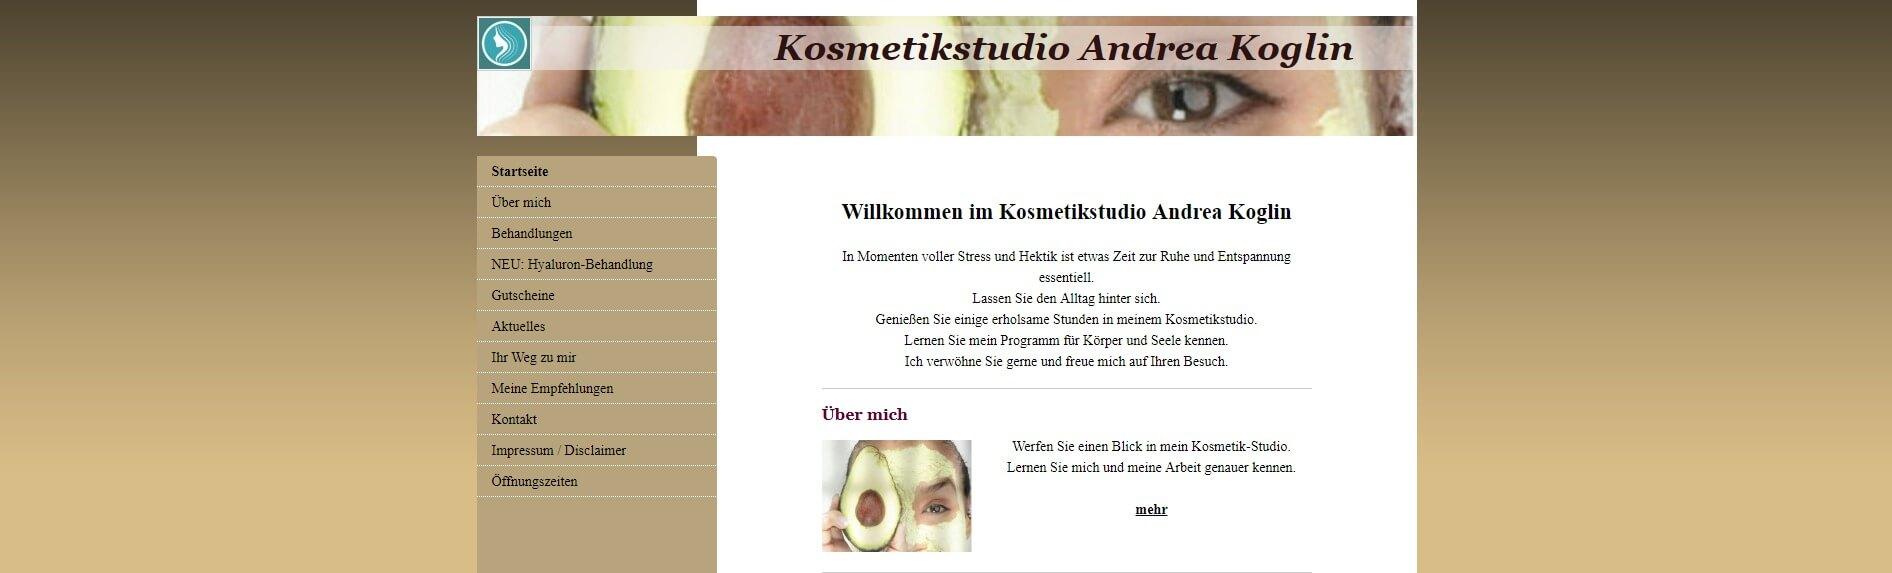 Image of Kosmetikstudio Andrea Koglin in Duisburg